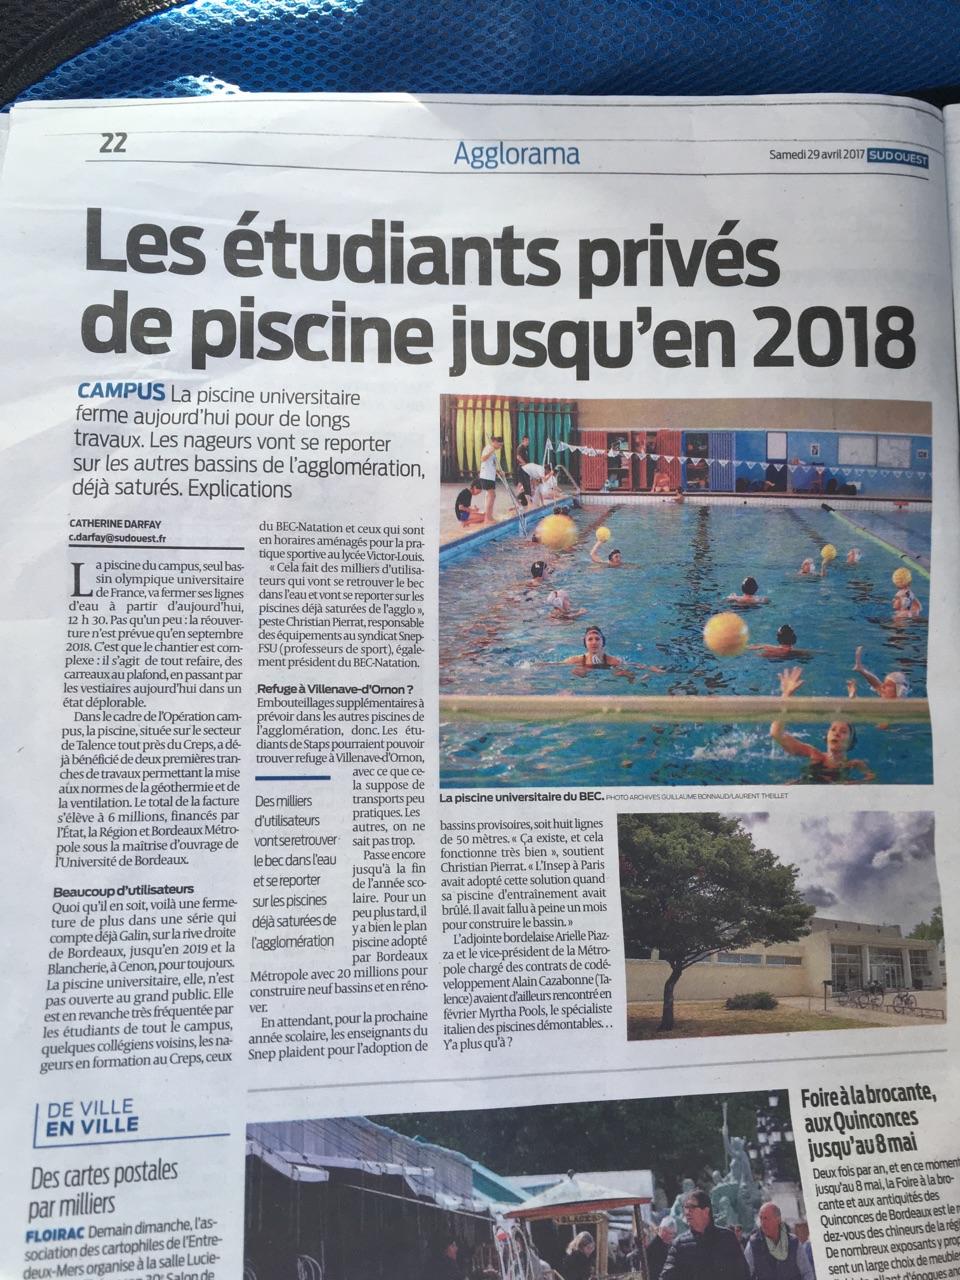 Equipements snep fsu bordeaux for Piscine universitaire talence